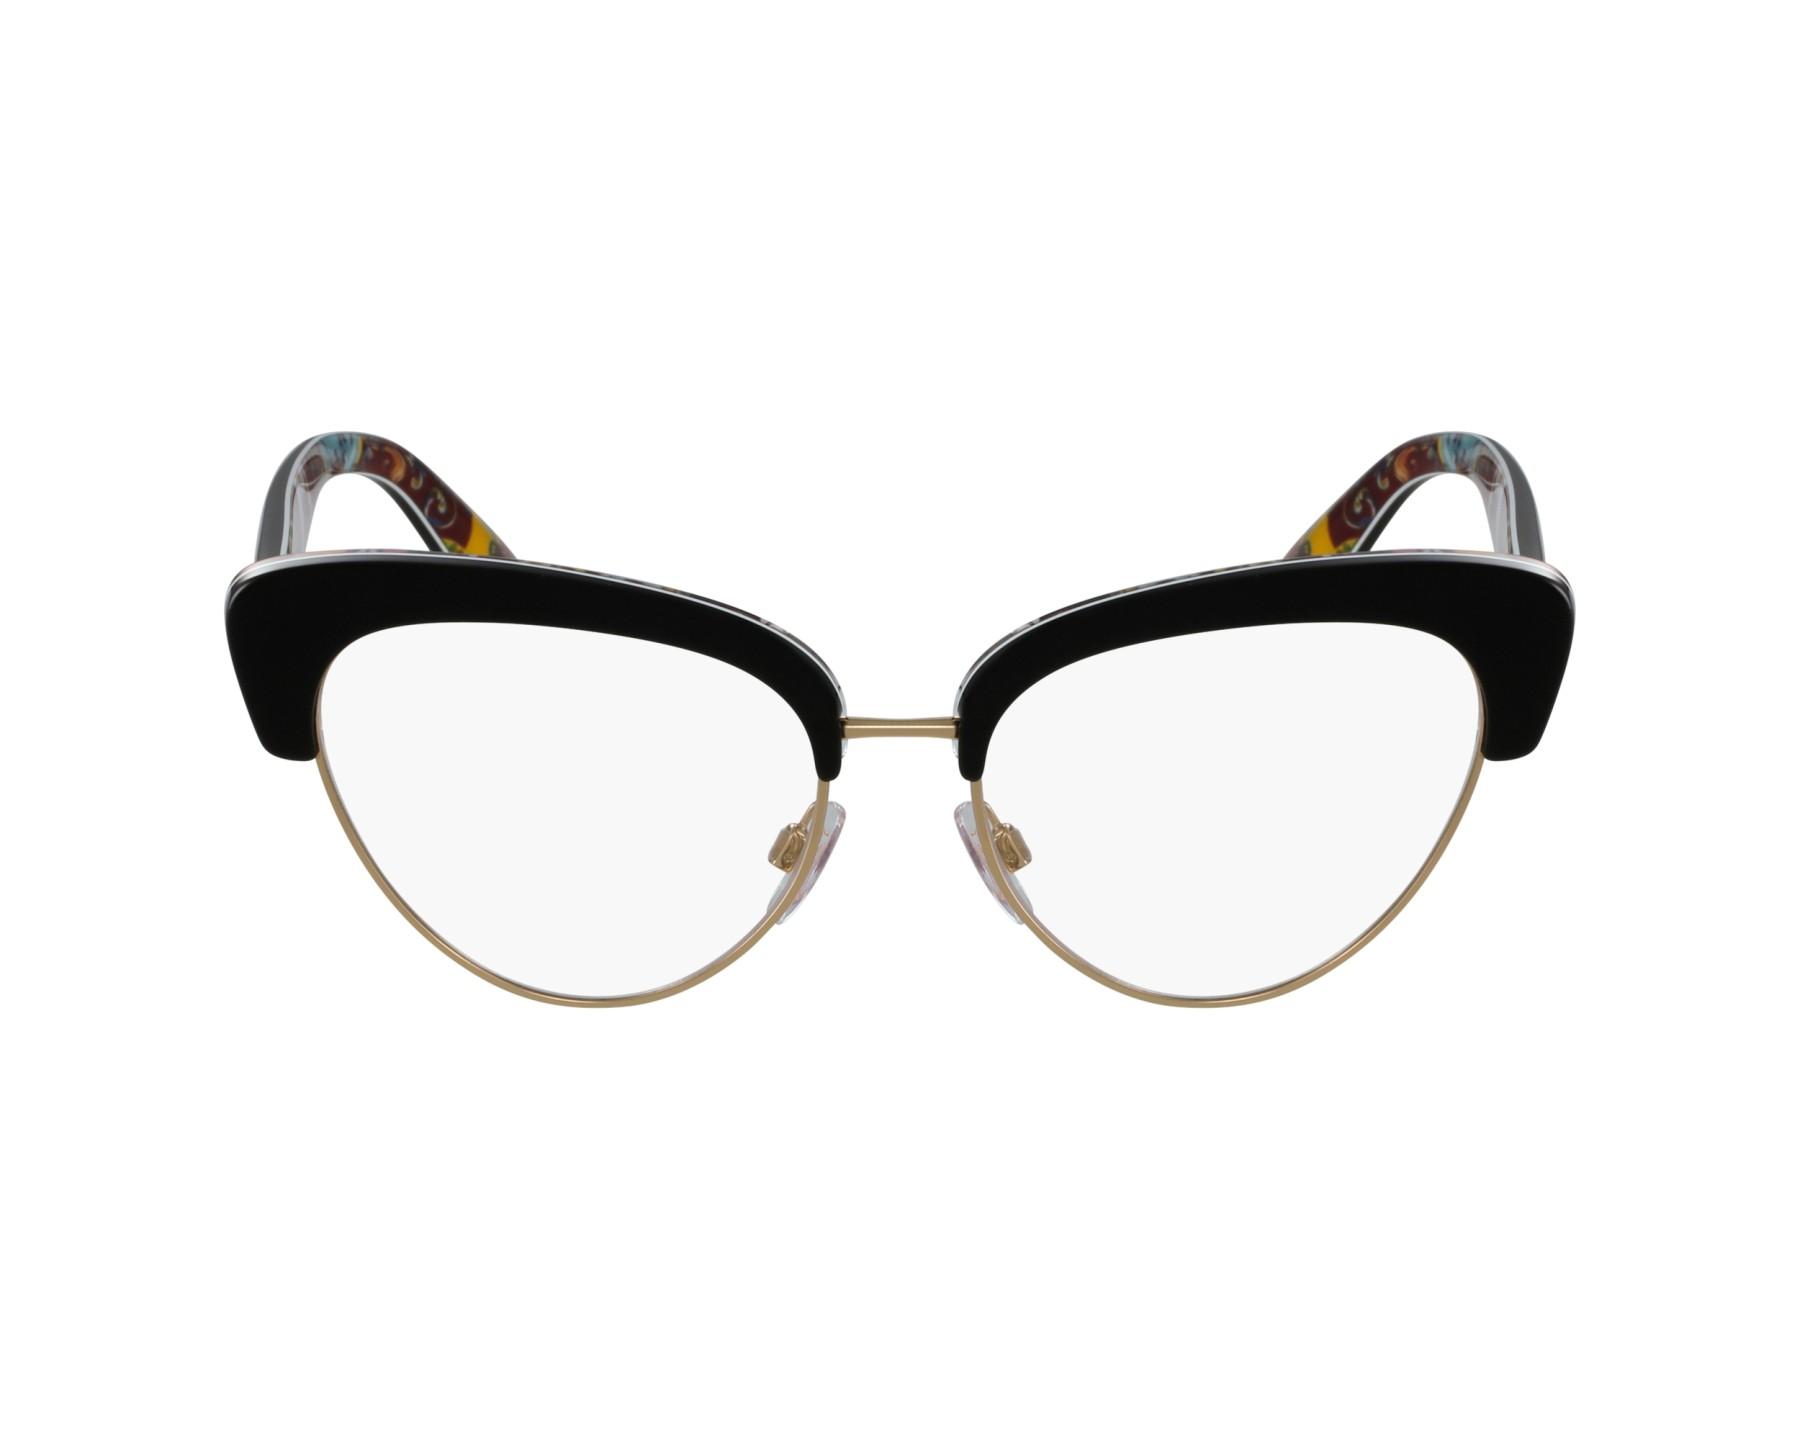 lunettes de vue dolce gabbana dg 3247 3033 noir. Black Bedroom Furniture Sets. Home Design Ideas